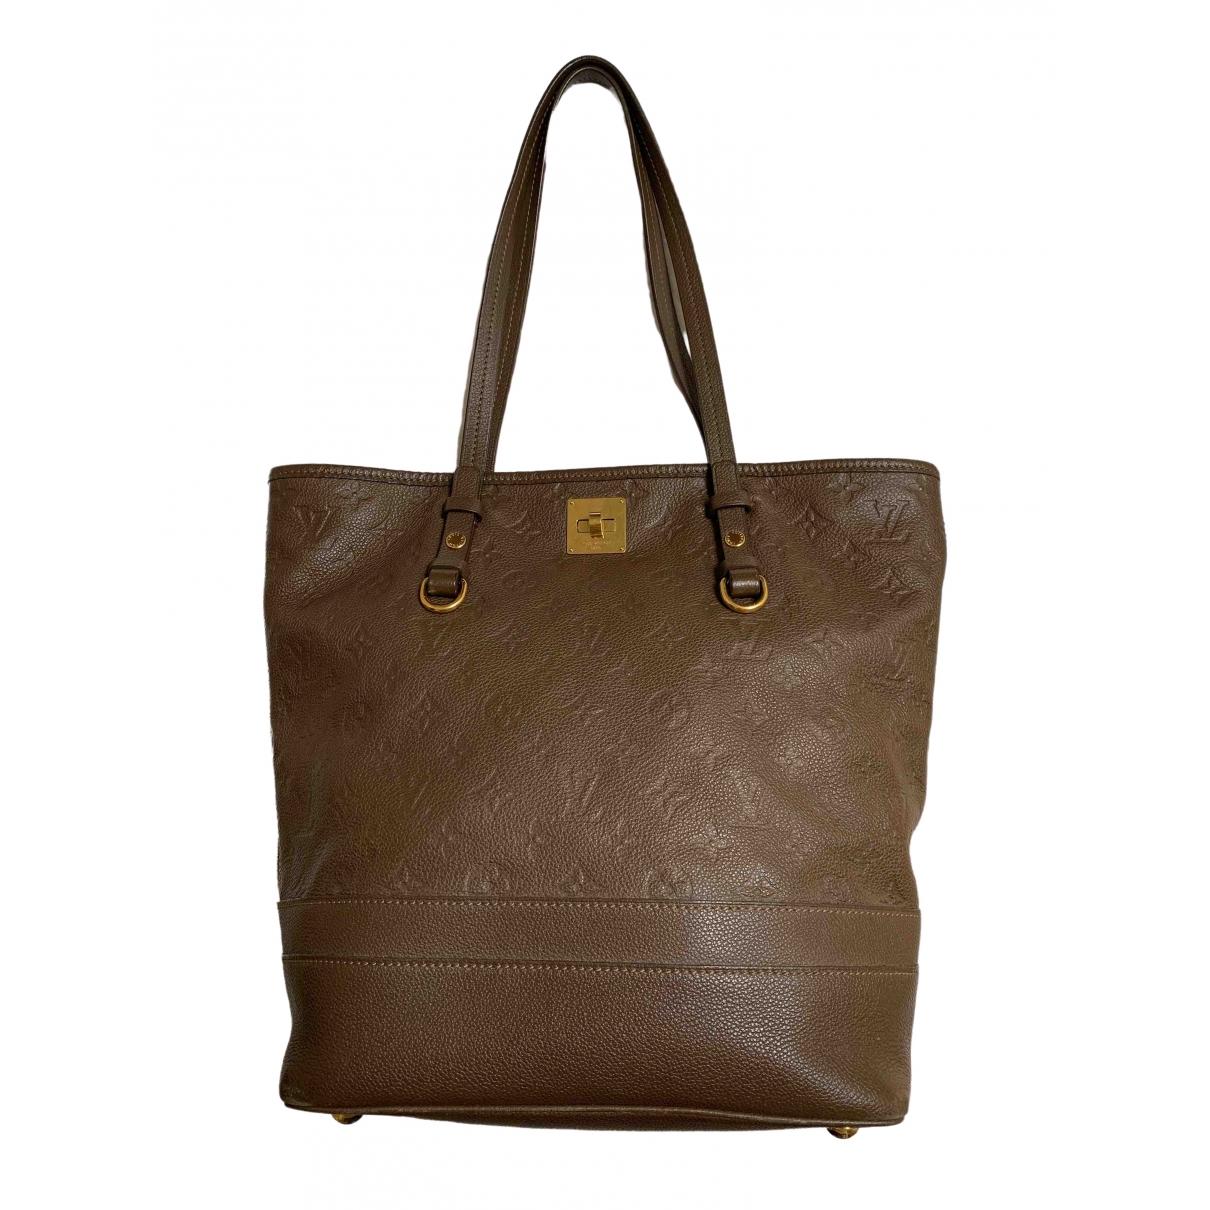 Louis Vuitton Citadine Brown Leather handbag for Women \N